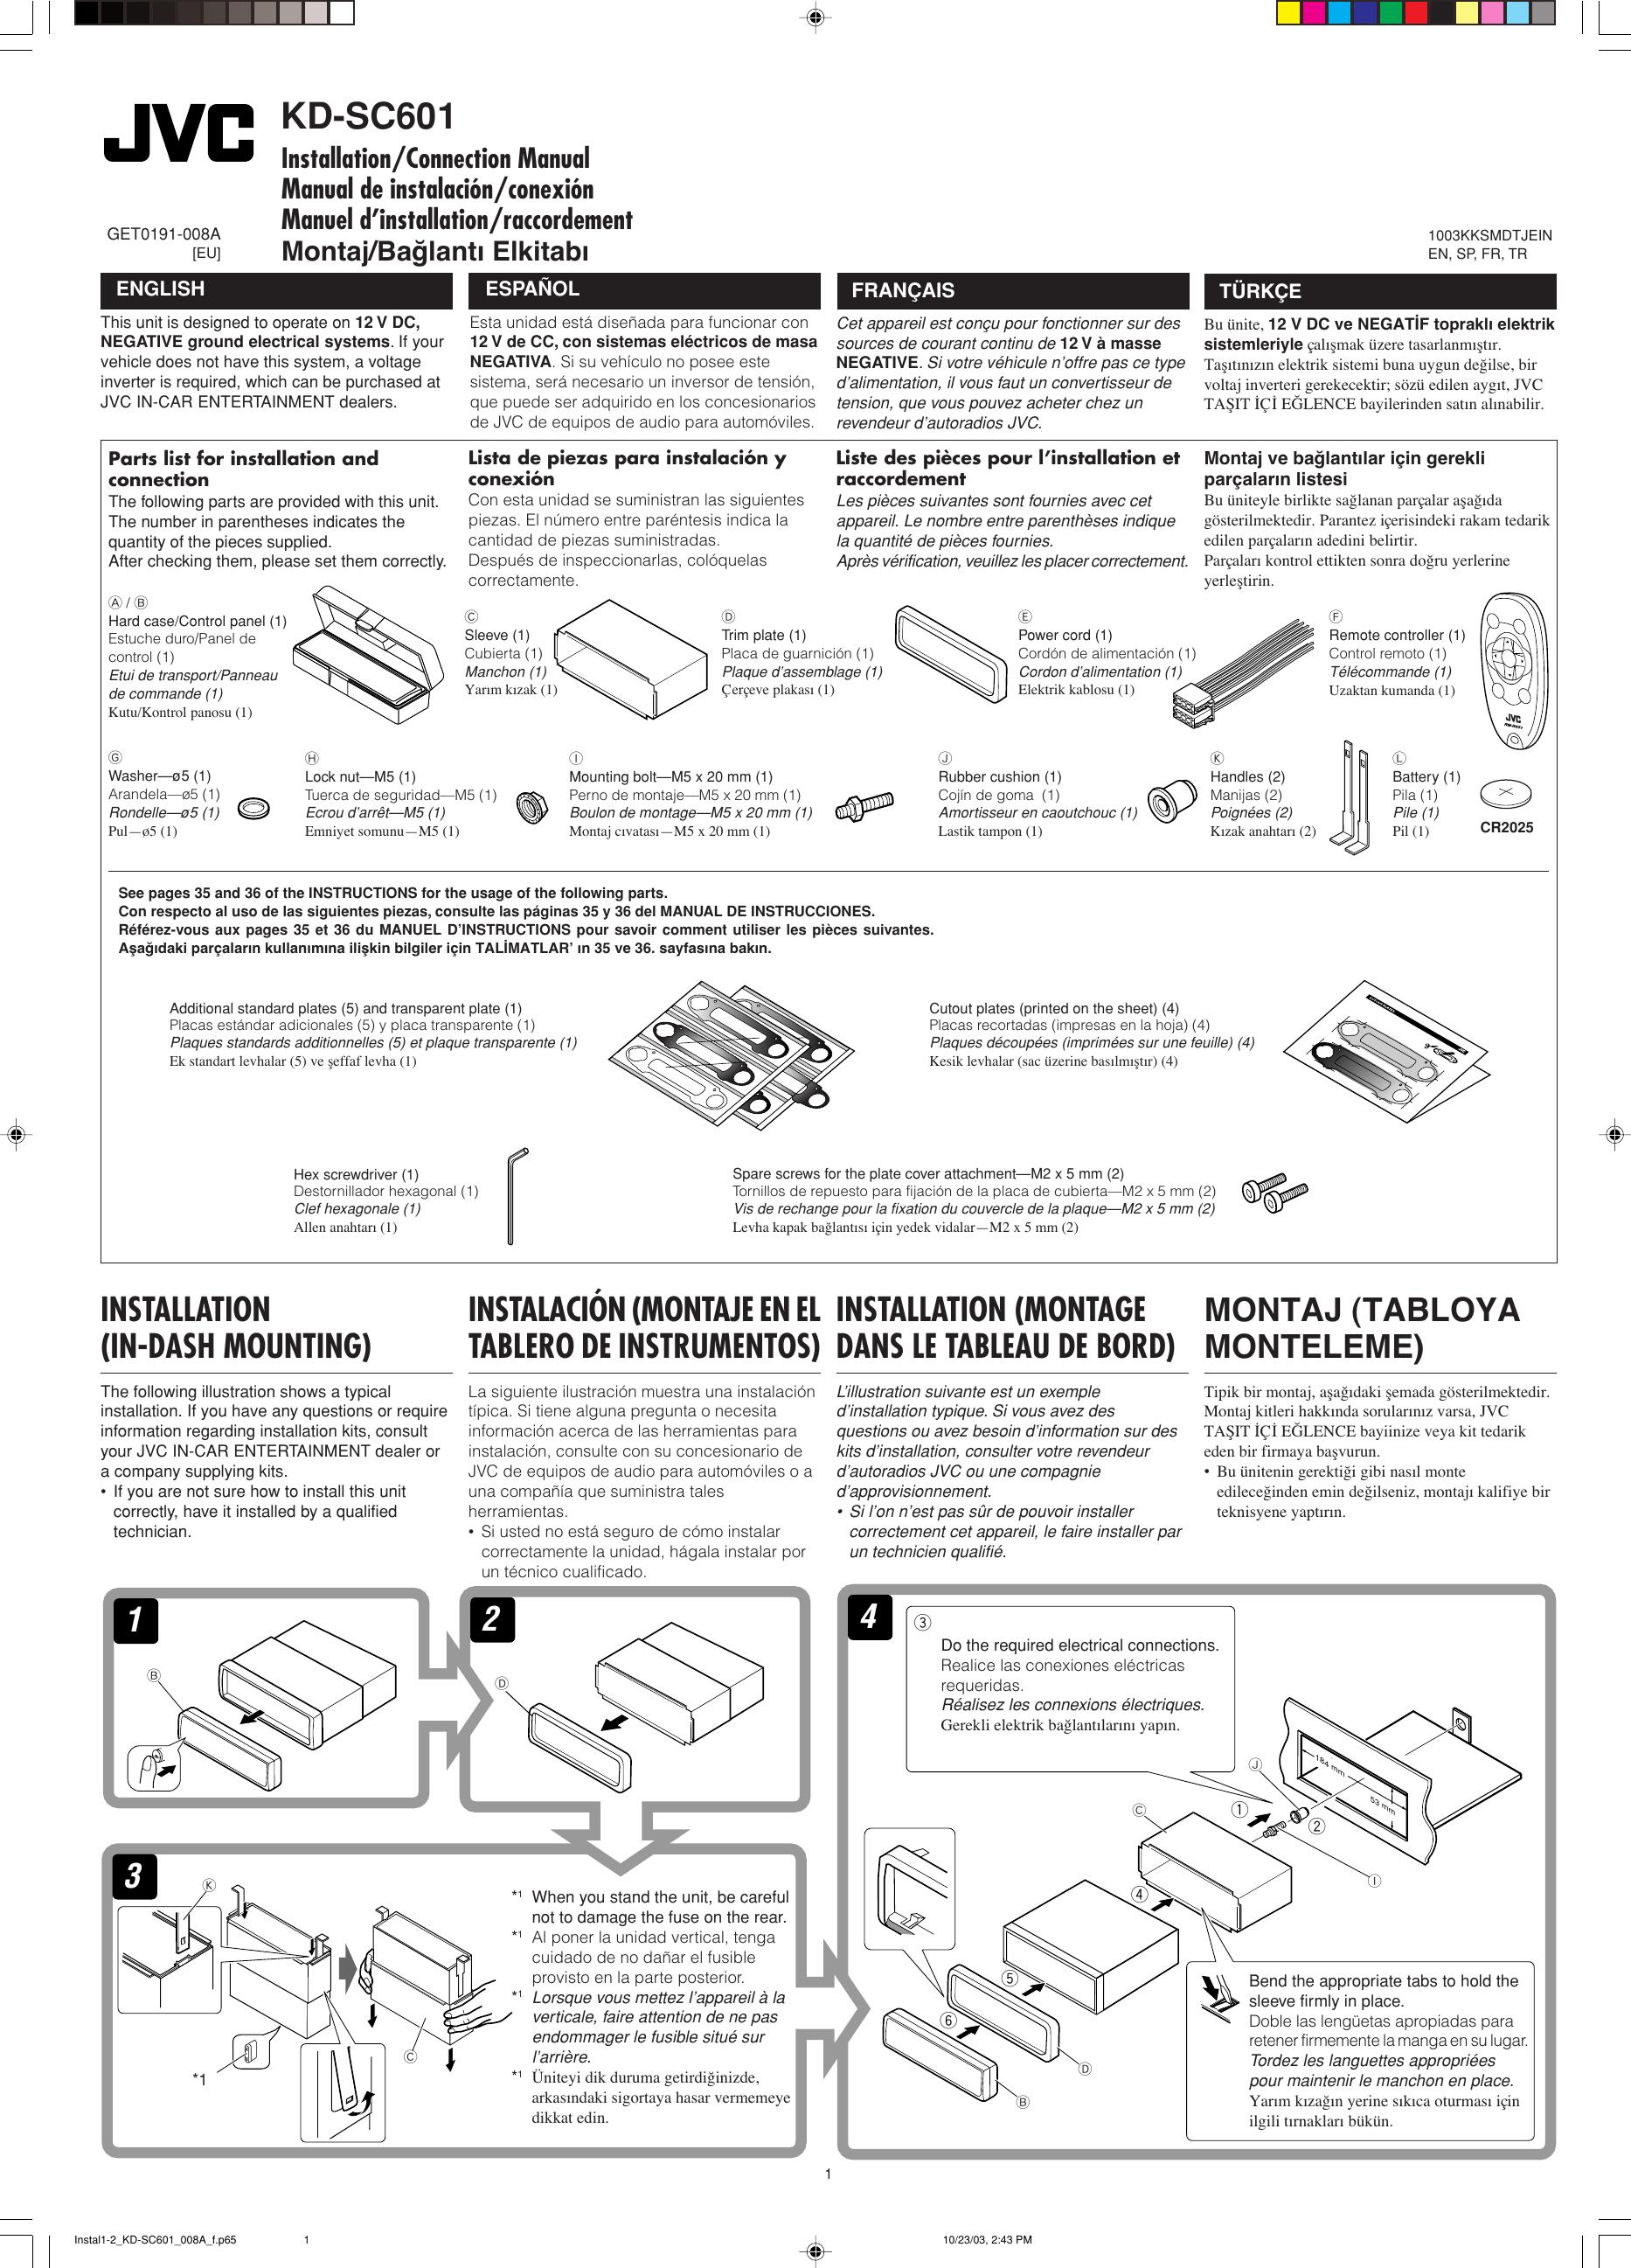 Wiring diagram jvc kd sc601 wiring diagrams schematics jvc kd sc601eu sc601 user manual get0191 008a rh usermanual wiki at wiring diagram jvc kd asfbconference2016 Image collections